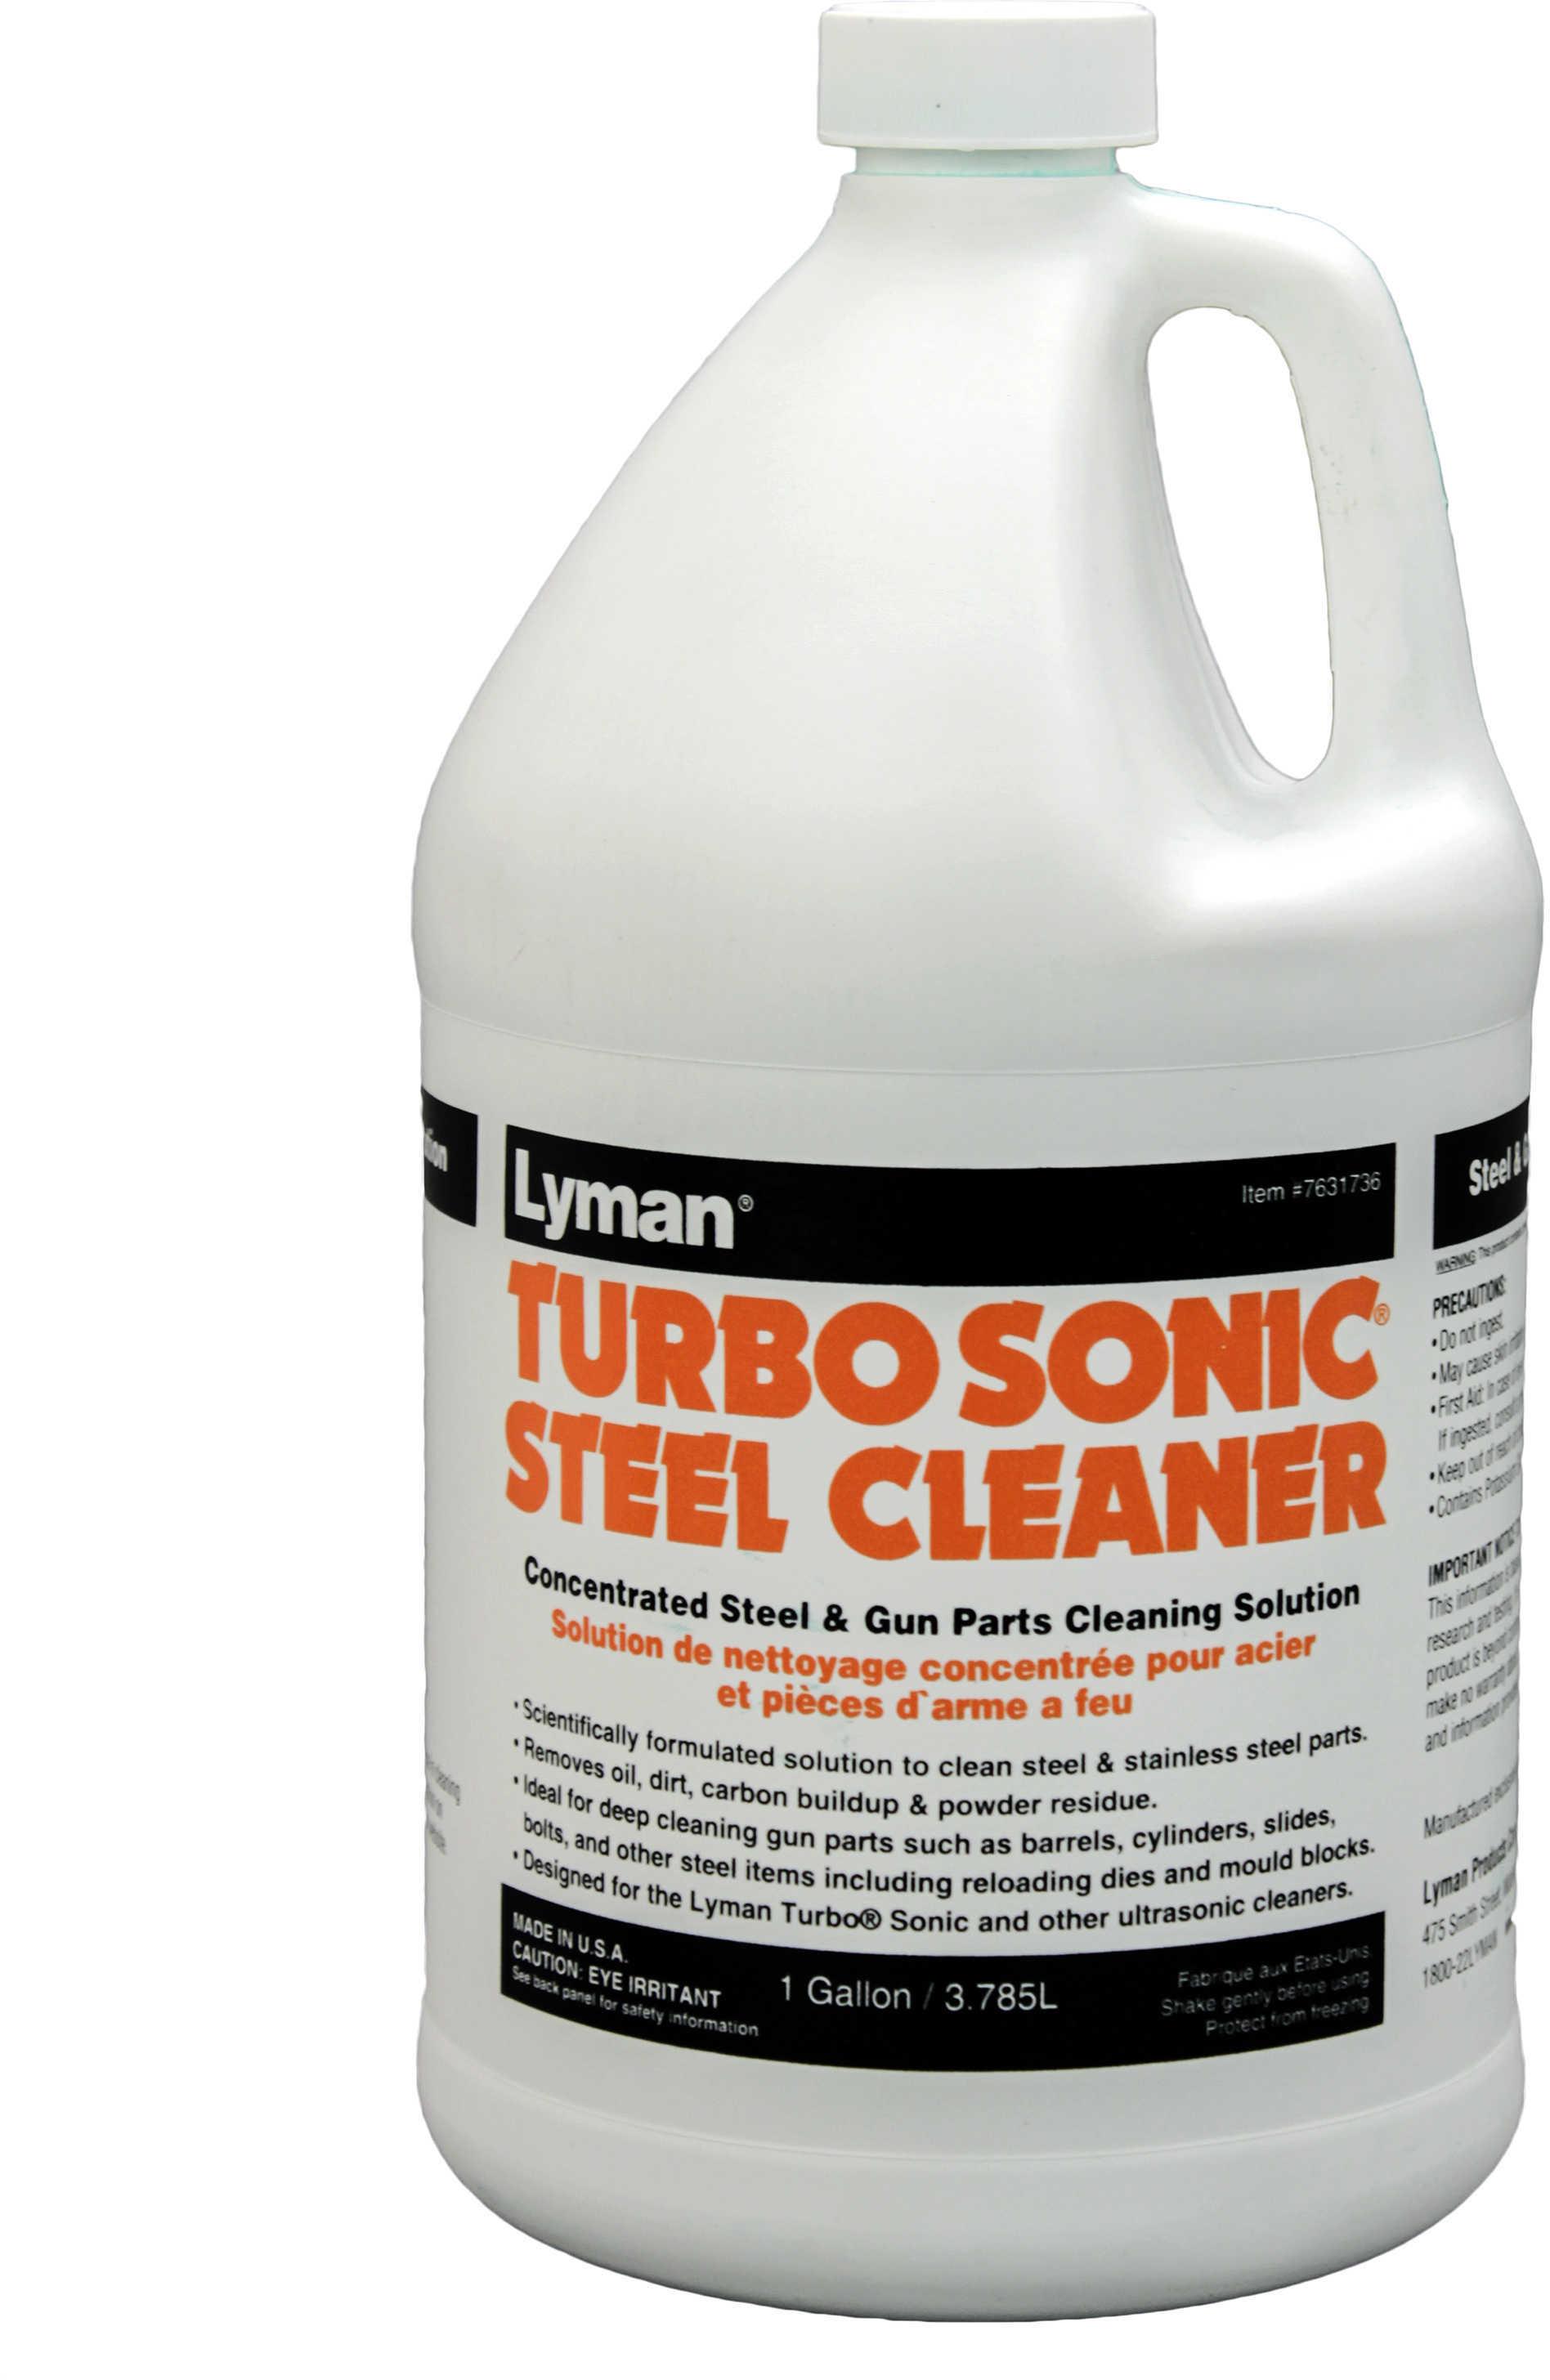 Lyman Turbosonic Steel Cleaner 1 Gallon